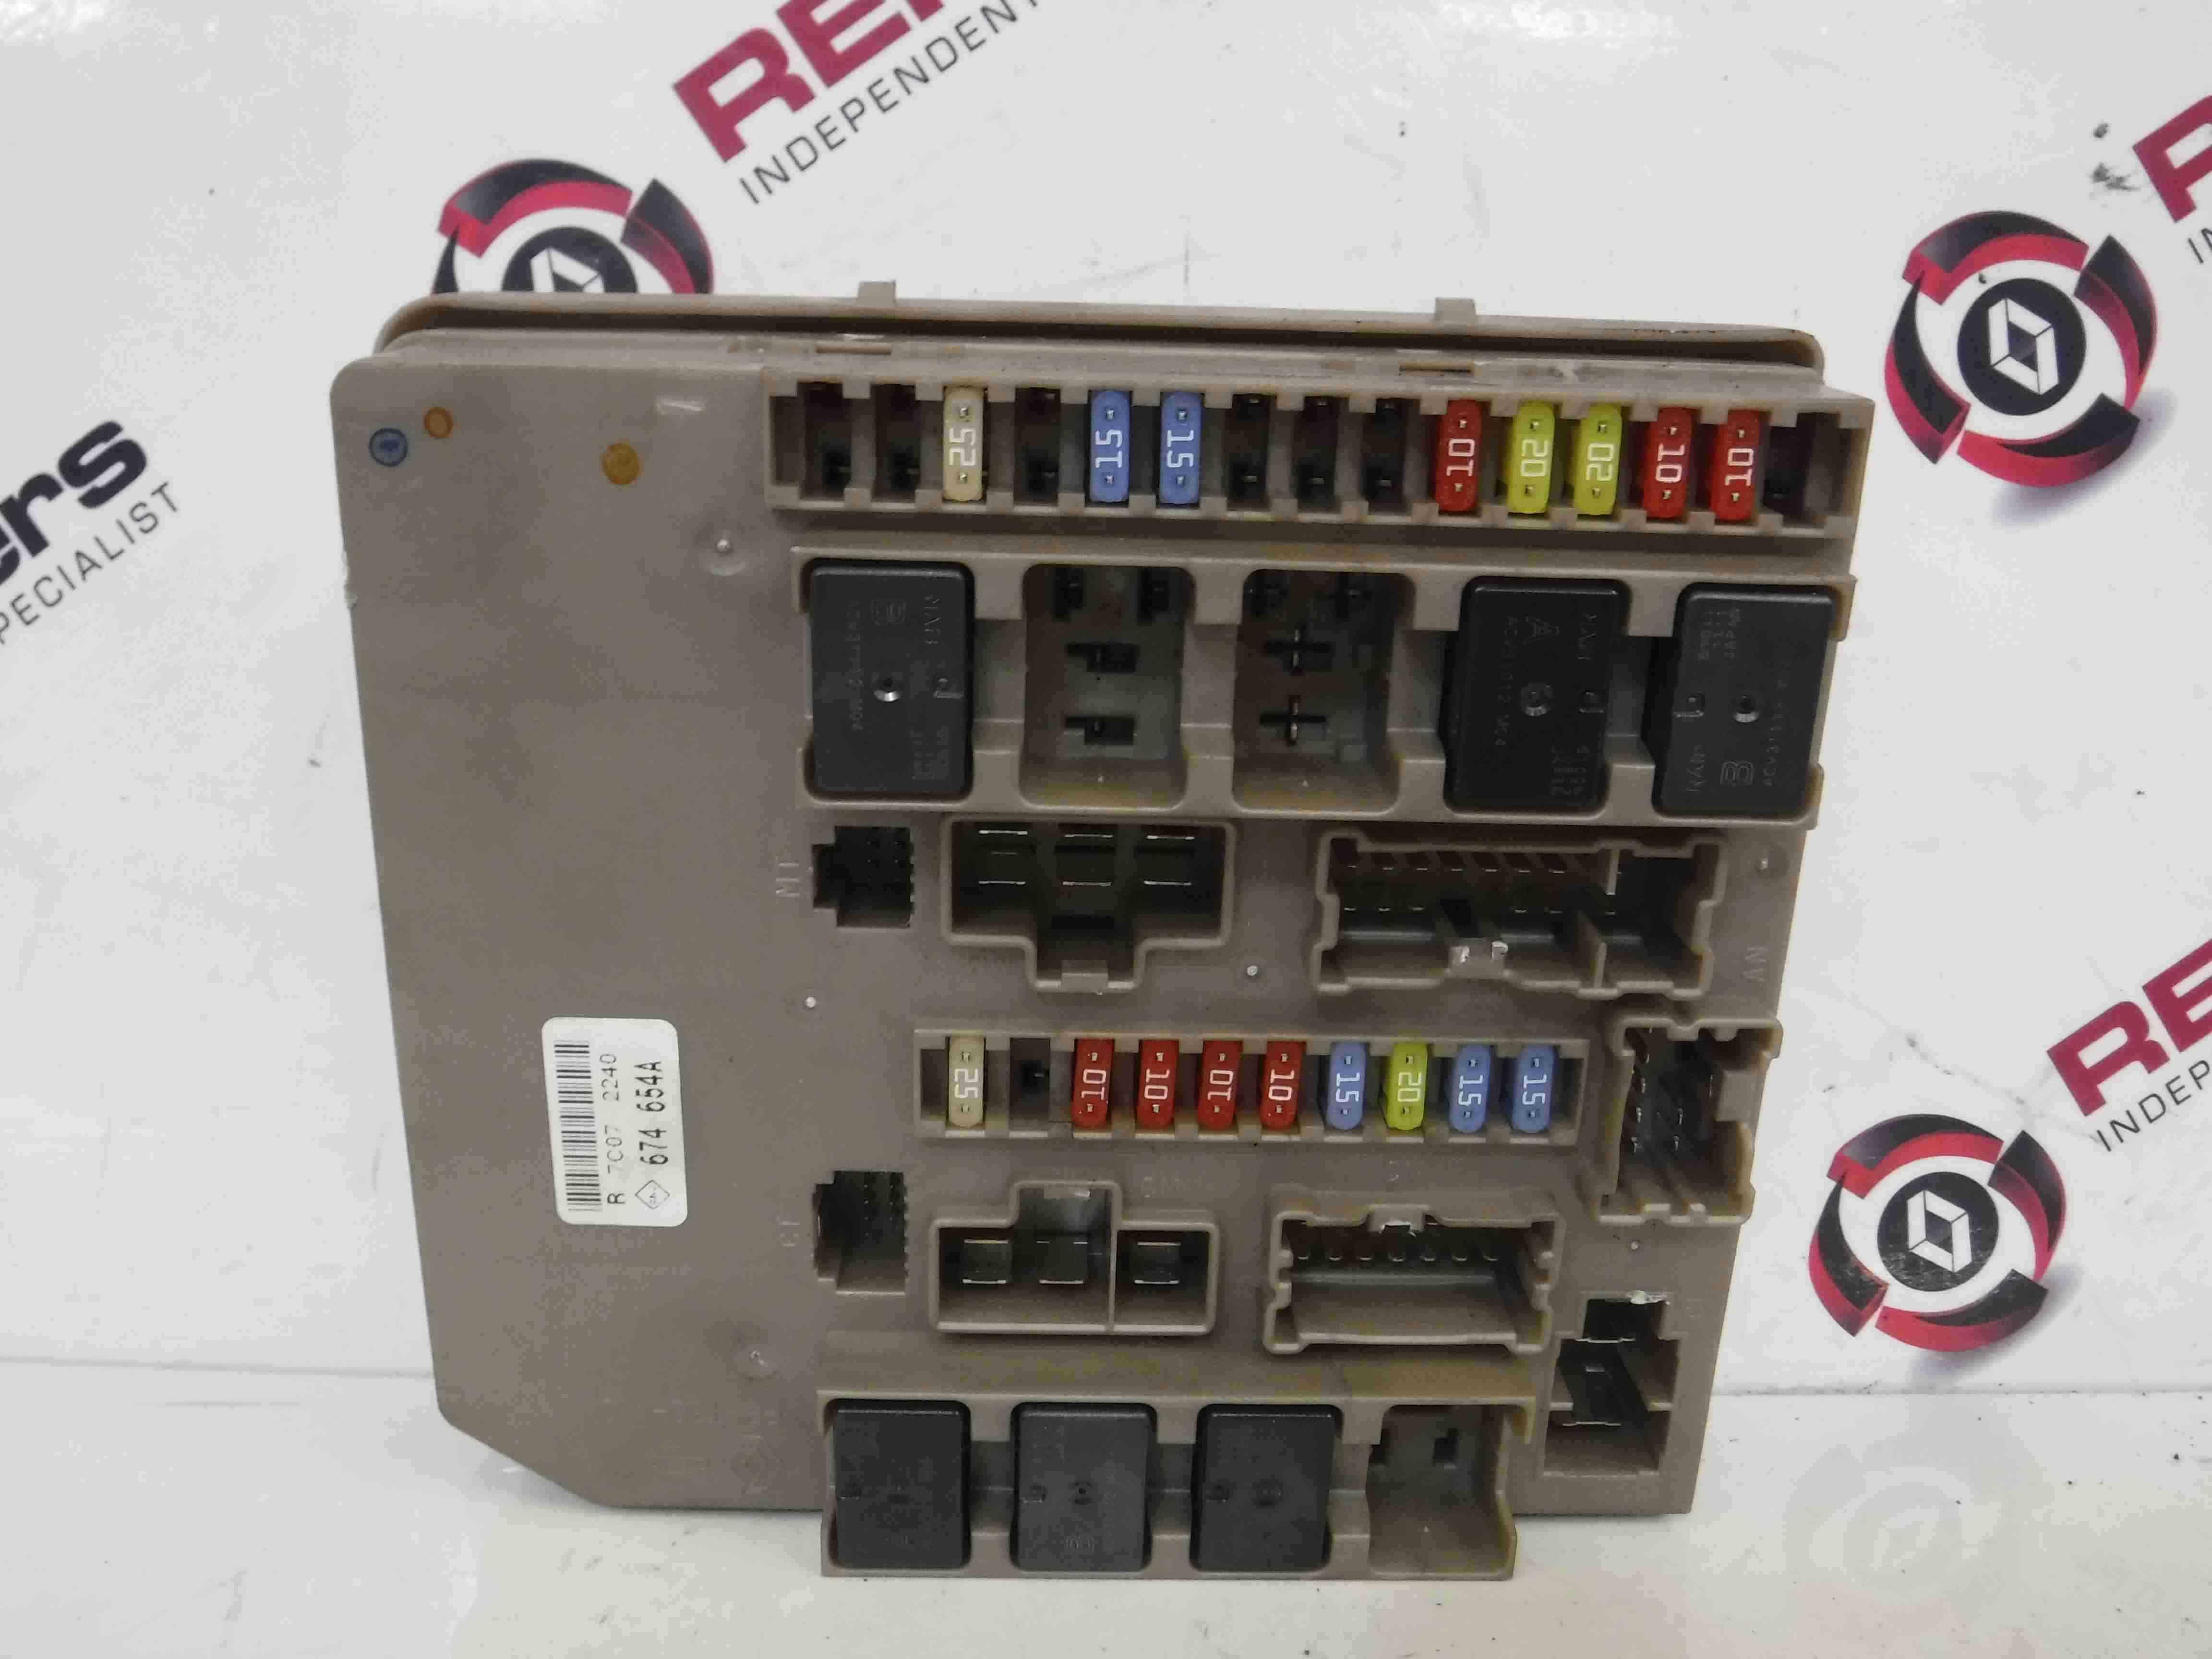 renault megane mk3 radio wiring diagram for craftsman garage door opener fuse box in clio library